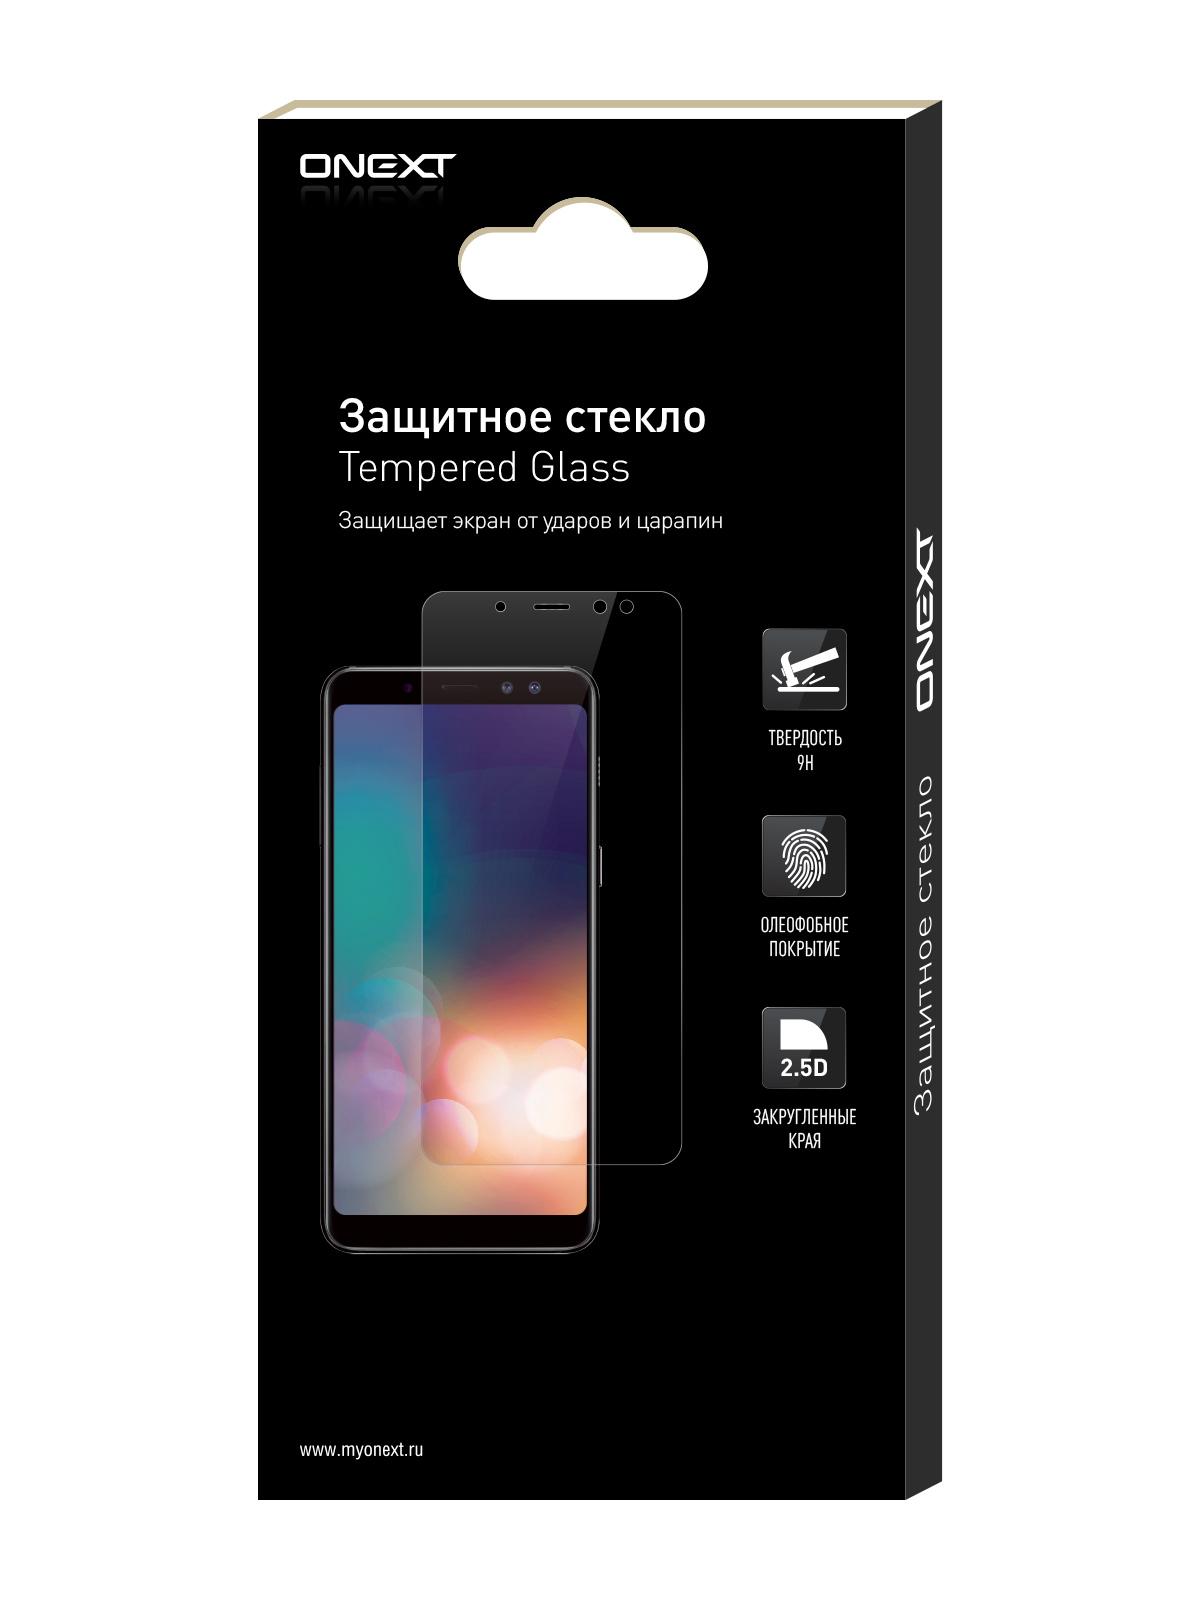 Защитное стекло ONEXT для Xiaomi Mi 5S Plus